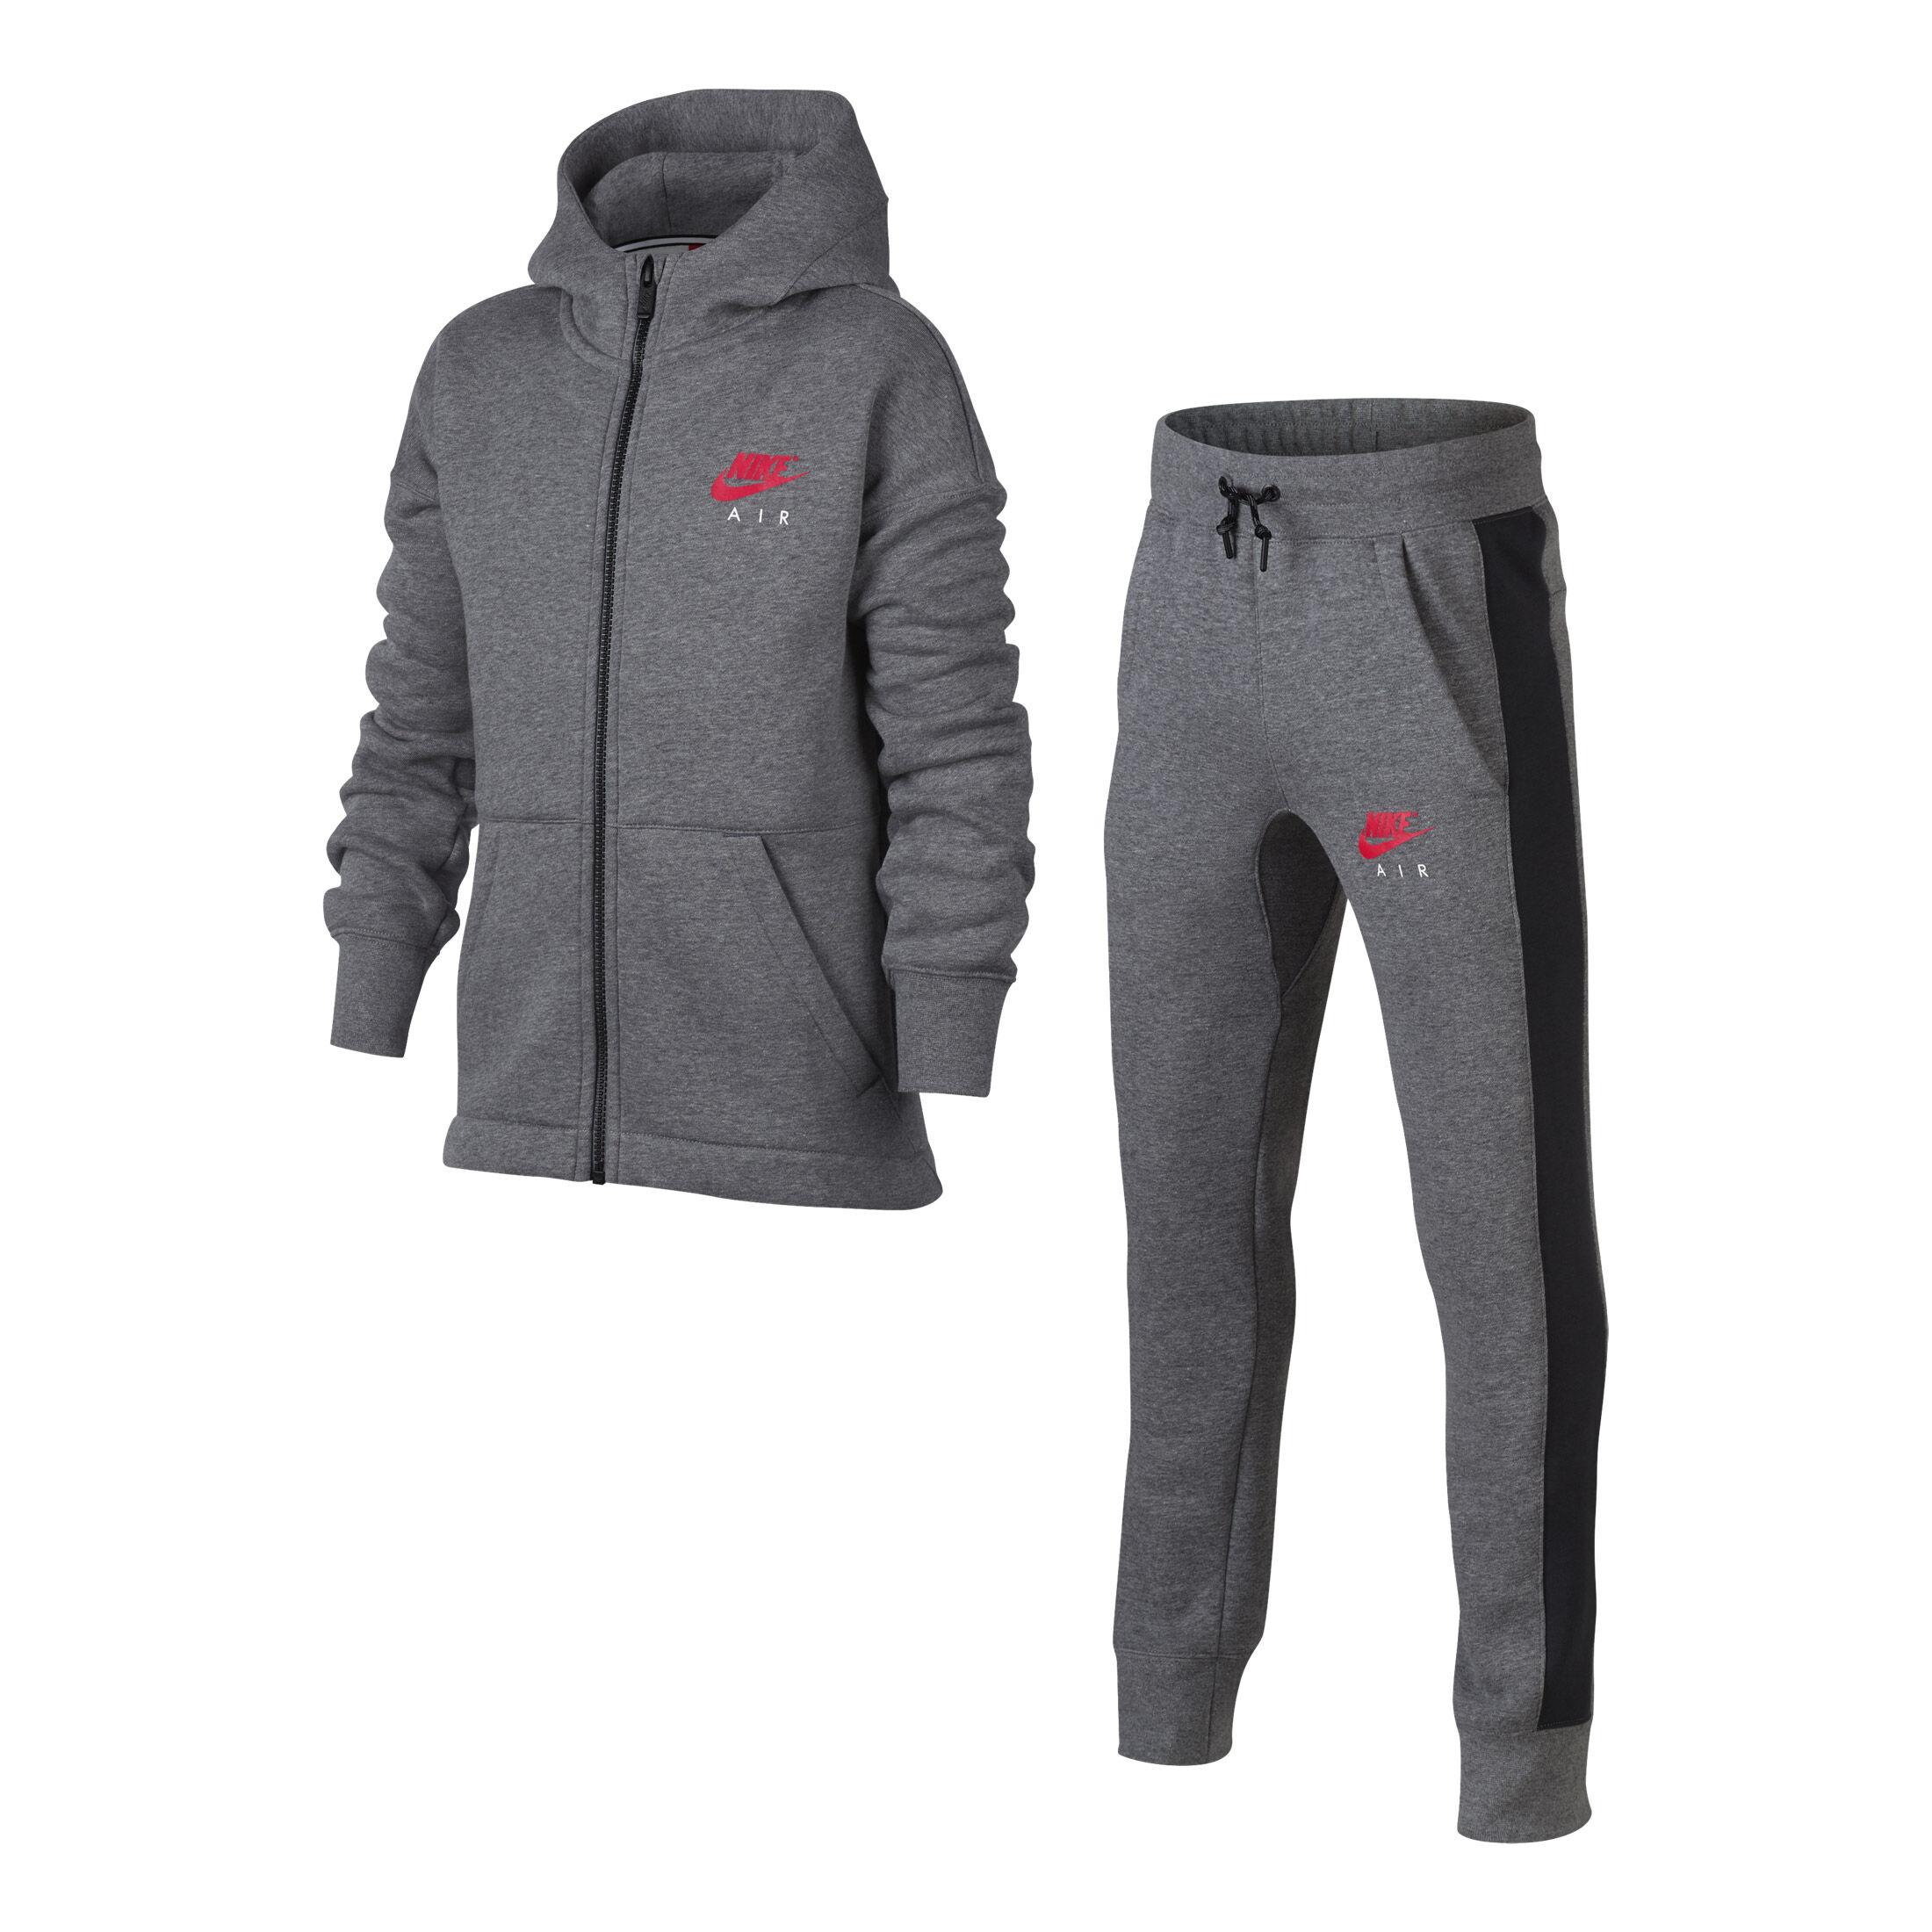 Trainingsanzug Air Nike GrauDunkelgrau Nike Jungen lcK1FJ